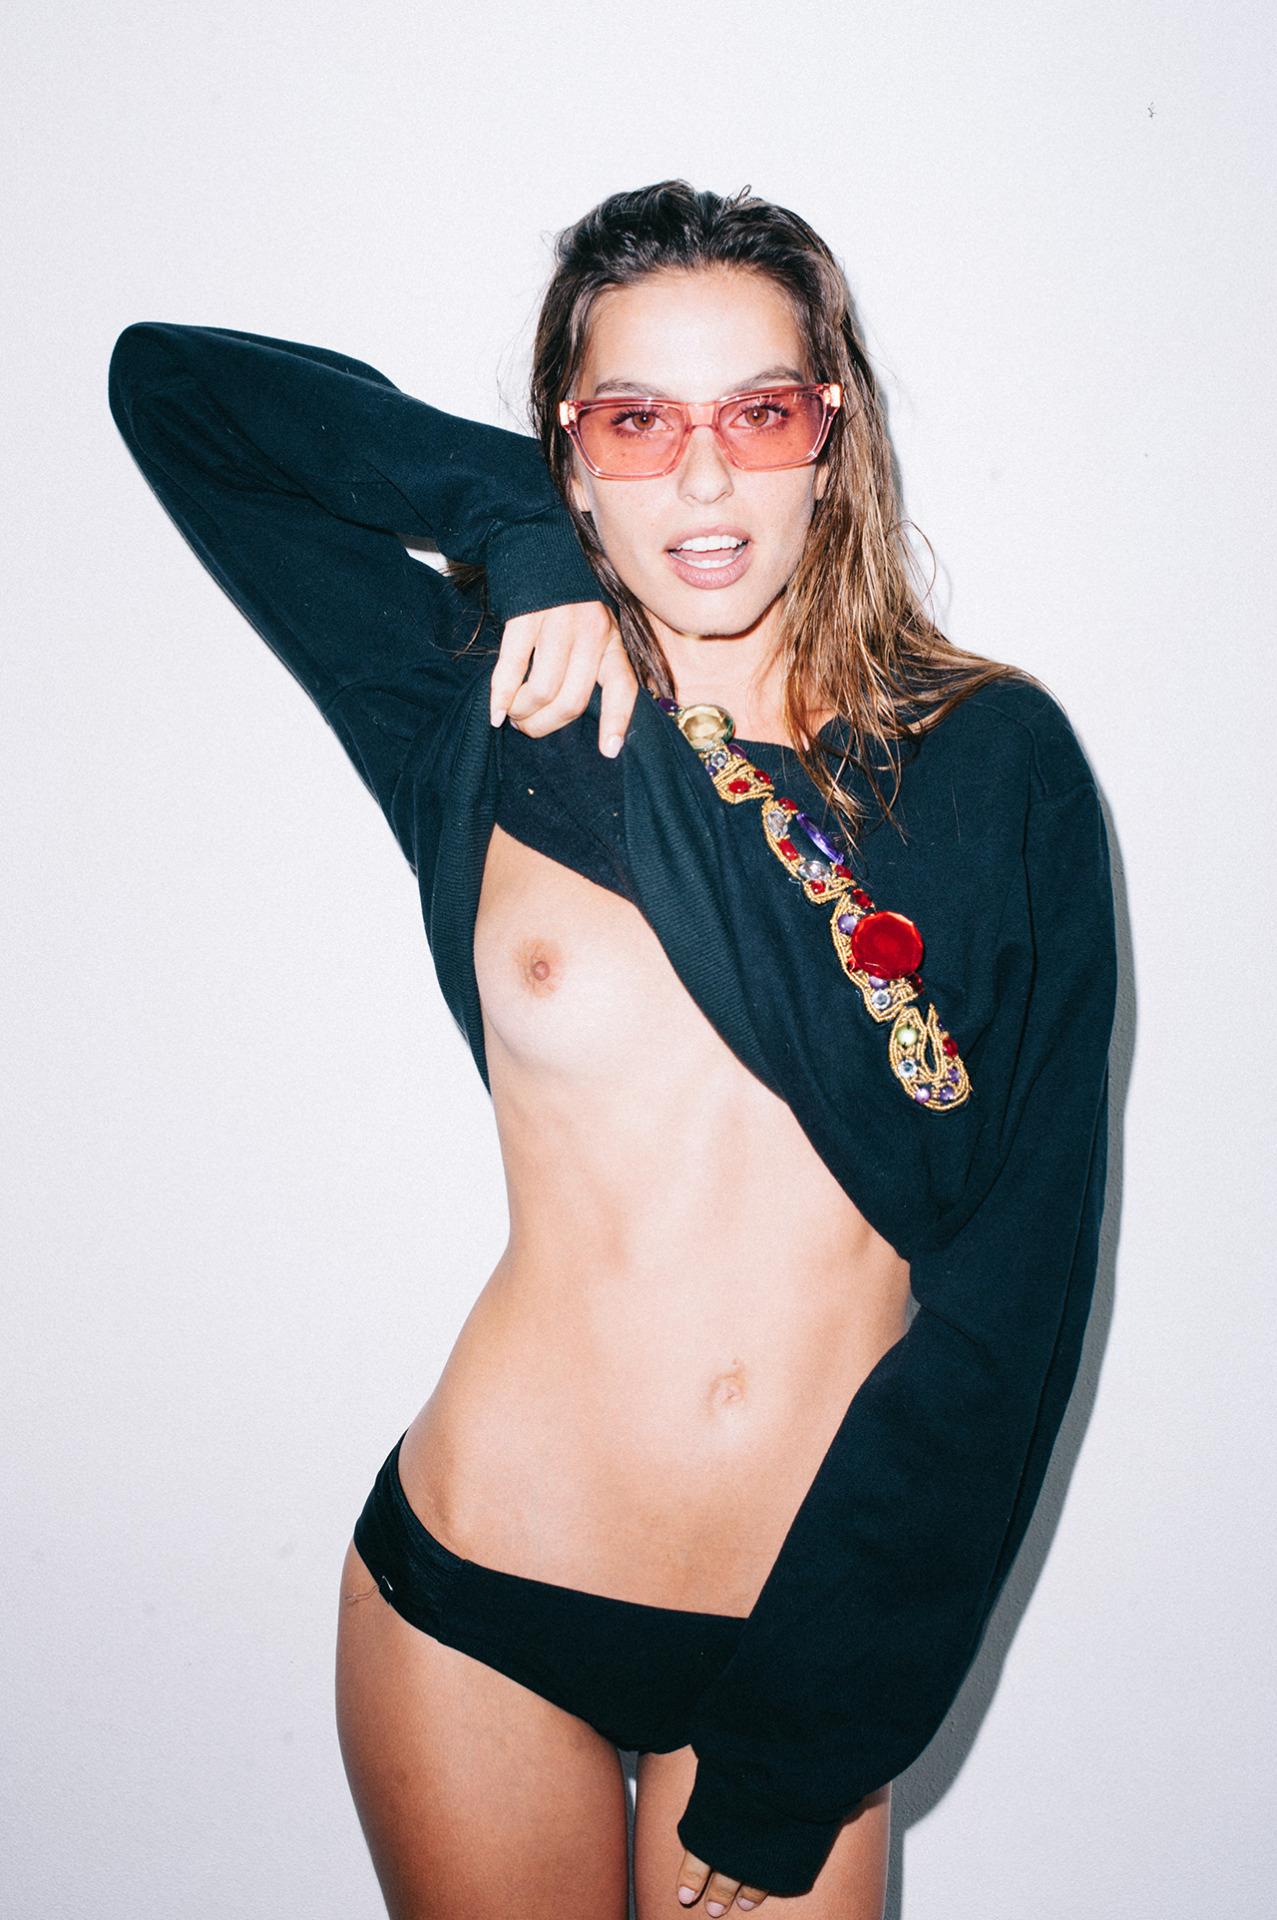 Alicia Medina mono boob